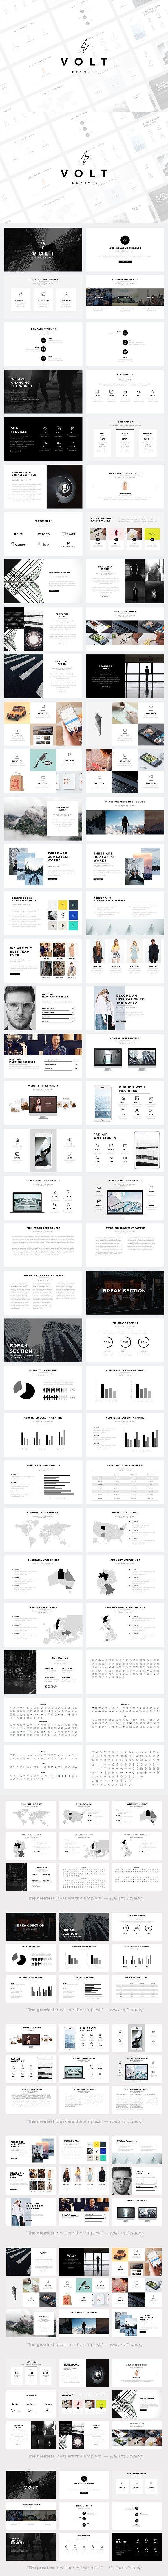 Volt Minimal Keynote Template. Graphic Design Infographics. $20.00